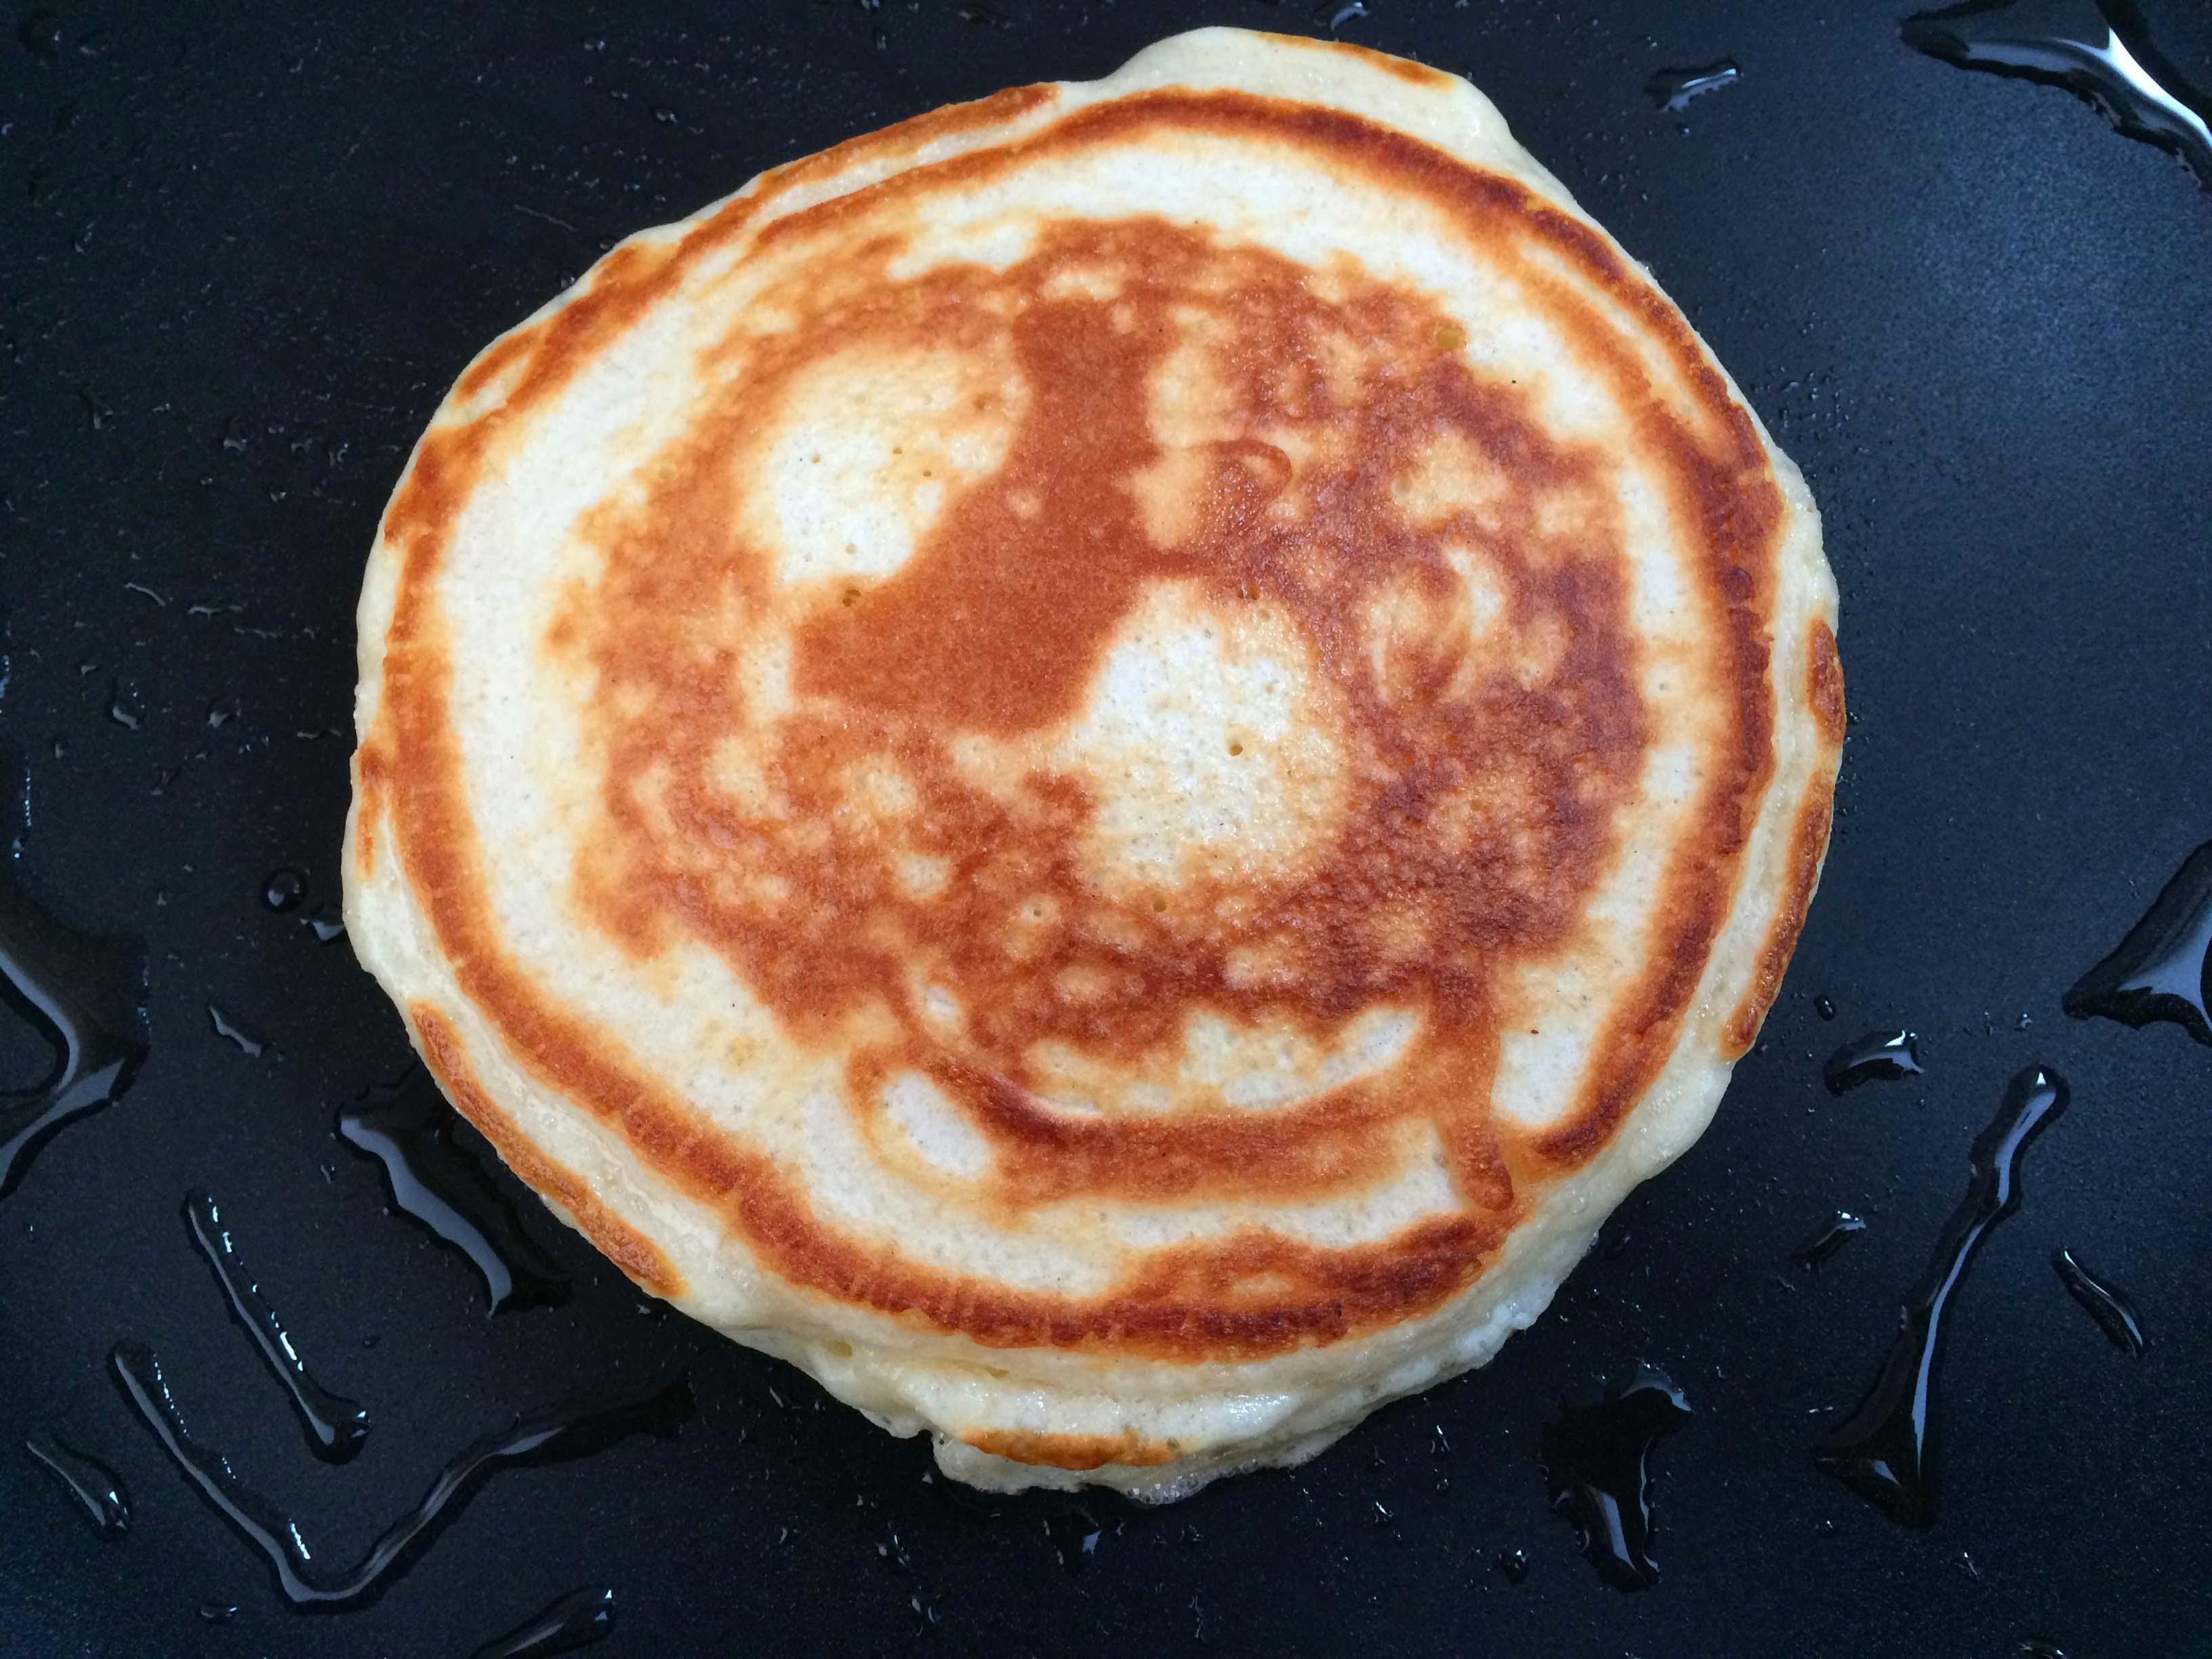 pancake omgedraaid